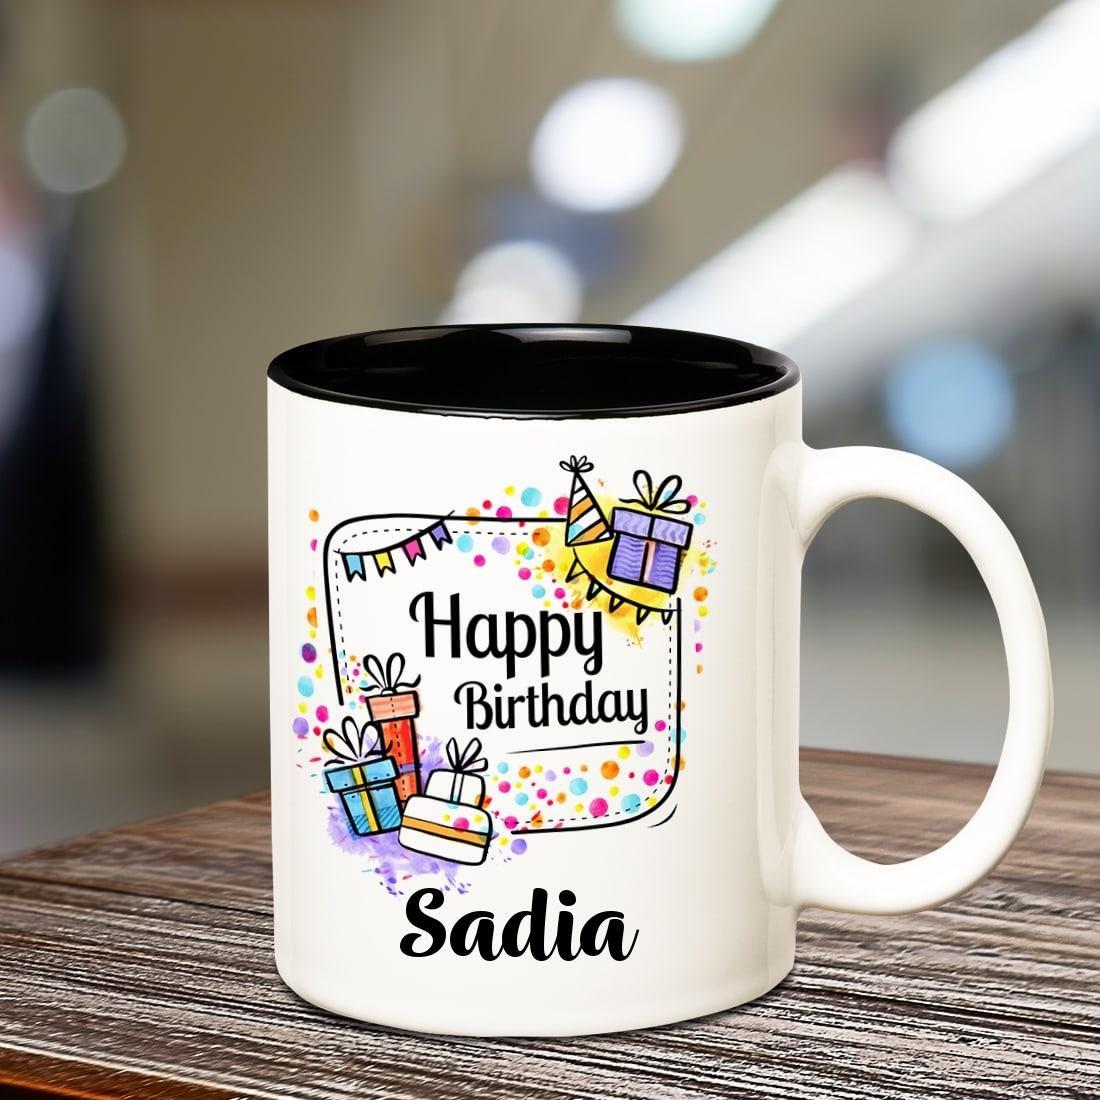 Huppme Happy Birthday Sadia Inner Black Coffee Name Mug